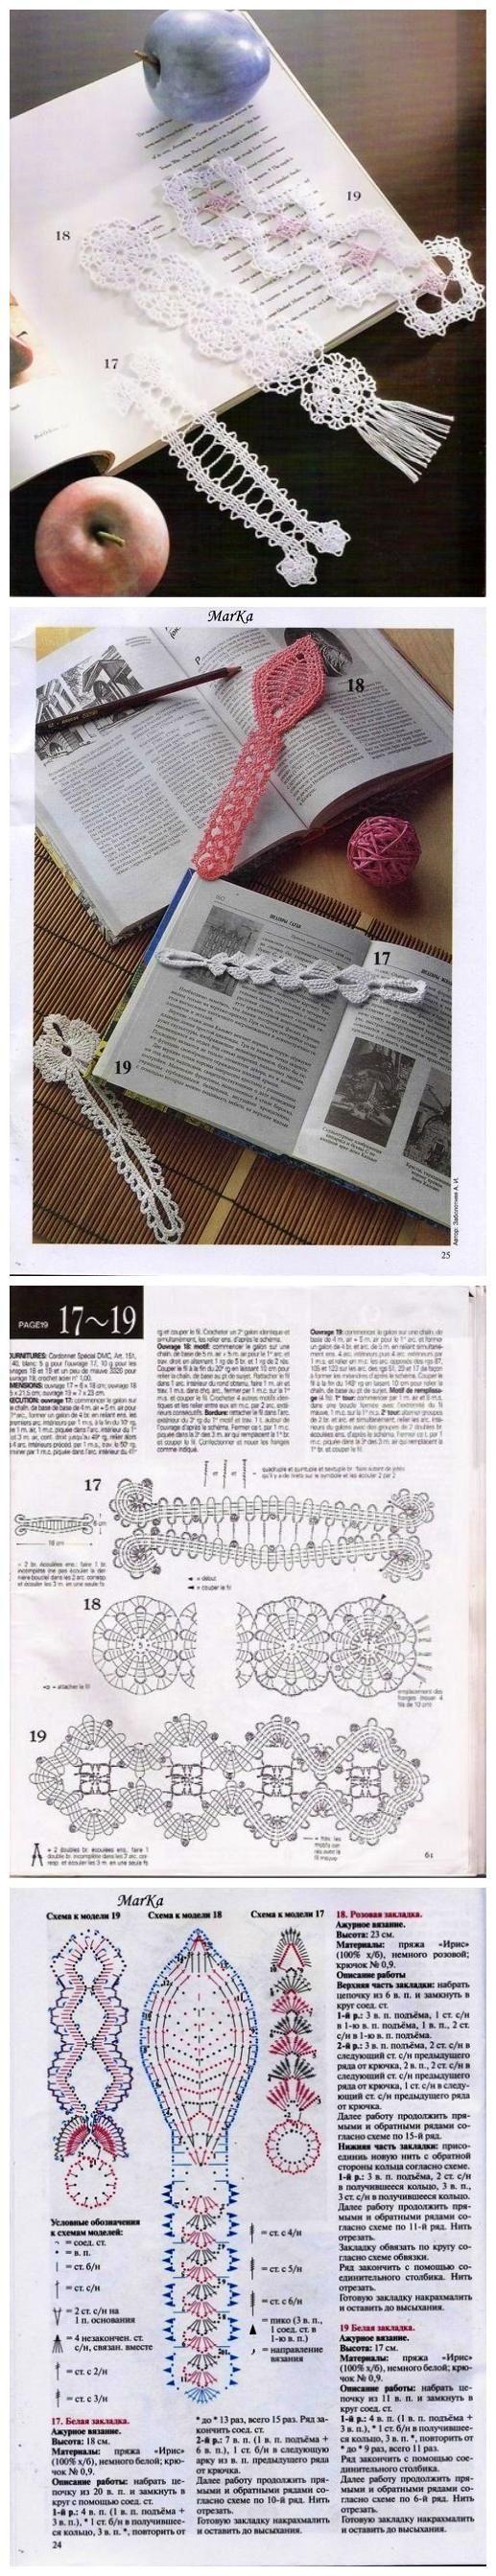 Free crochet bookmark patterns.: | crochet items | Pinterest ...